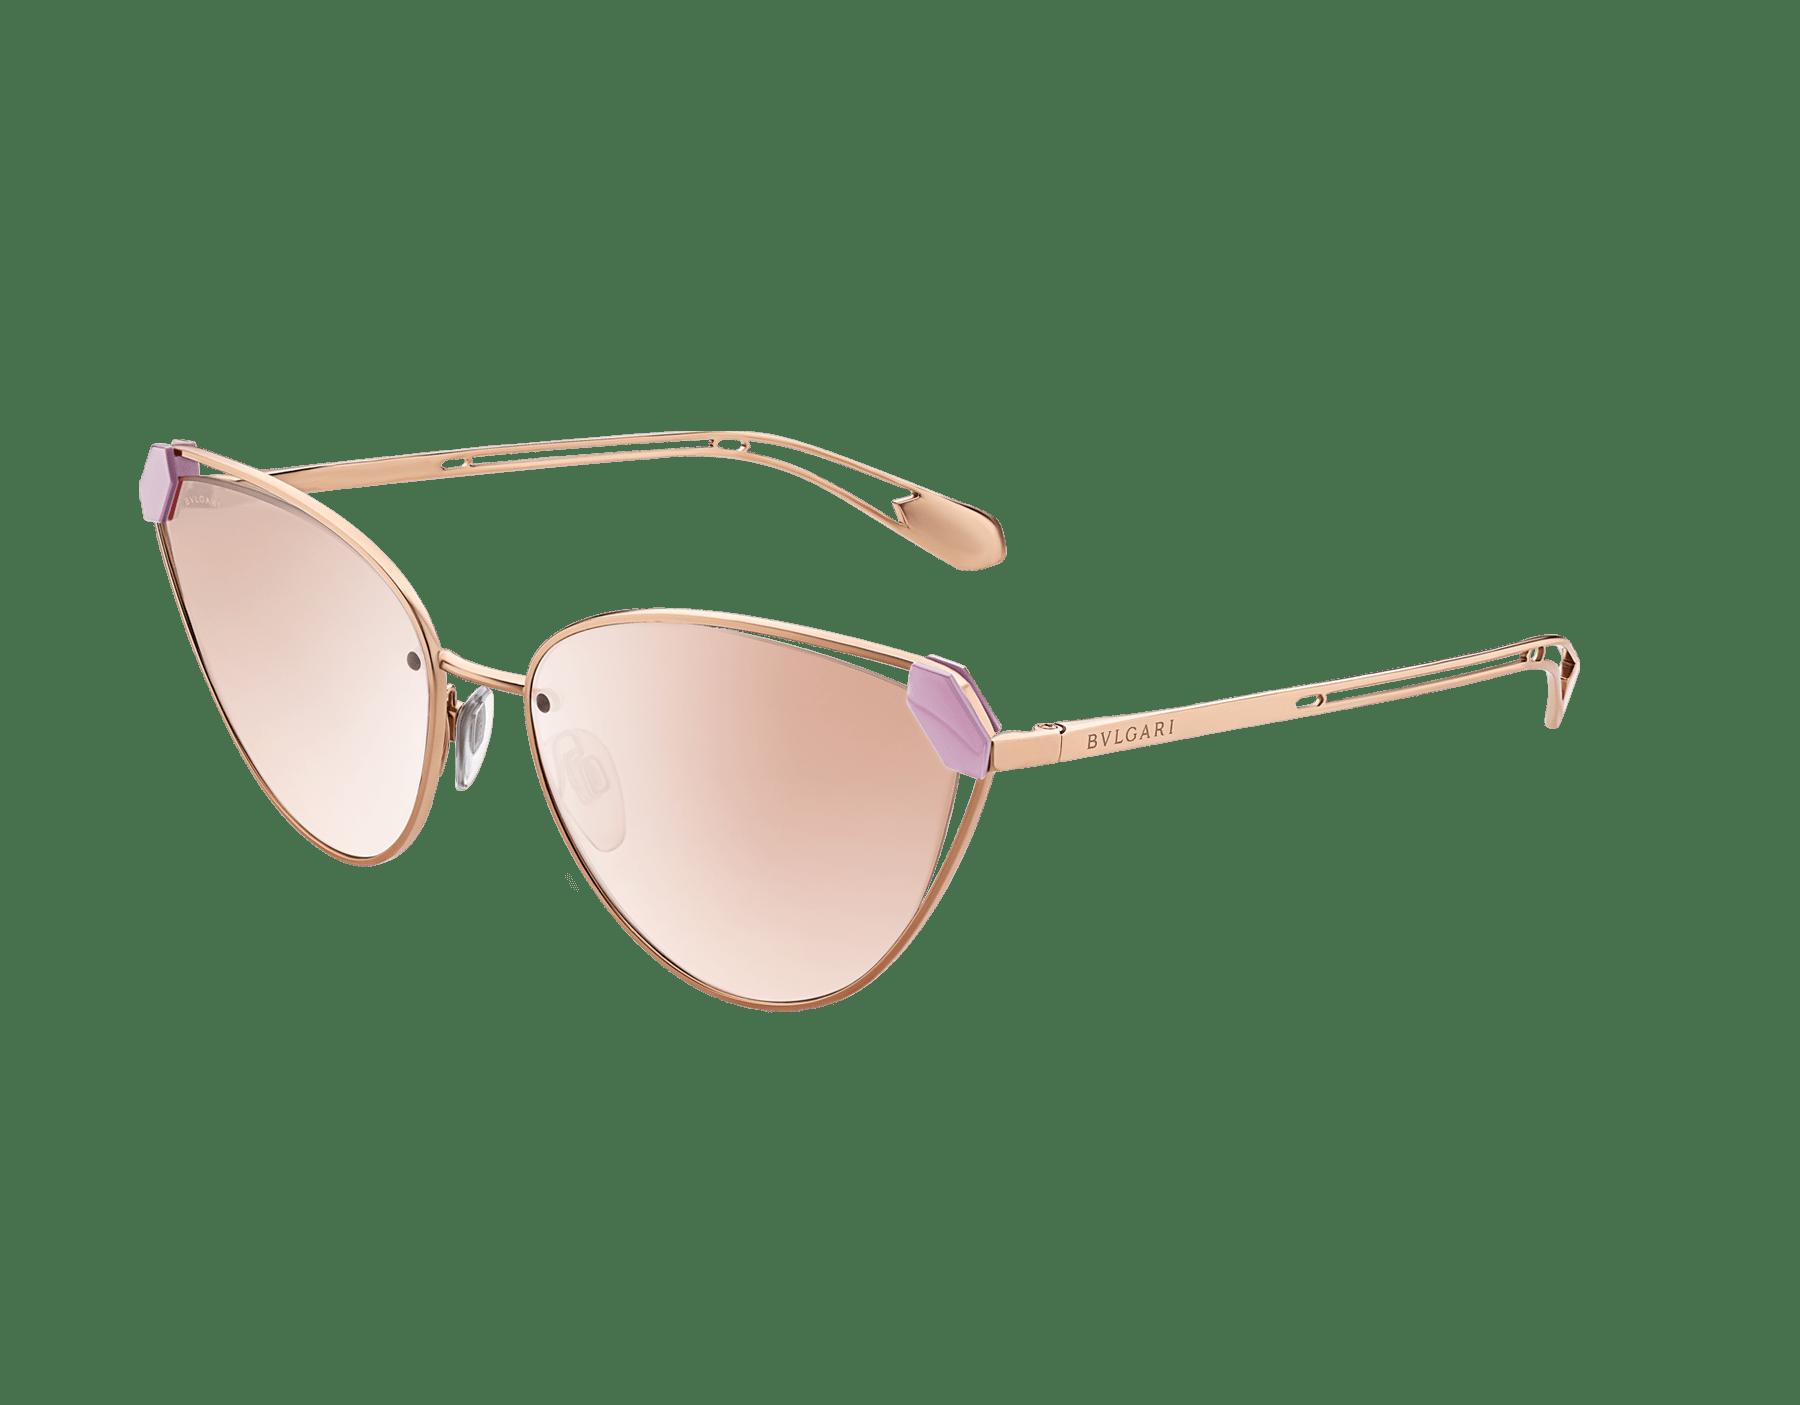 Bvlgari Serpenti Candy Scale narrow cat-eye metal sunglasses. 903727 image 1